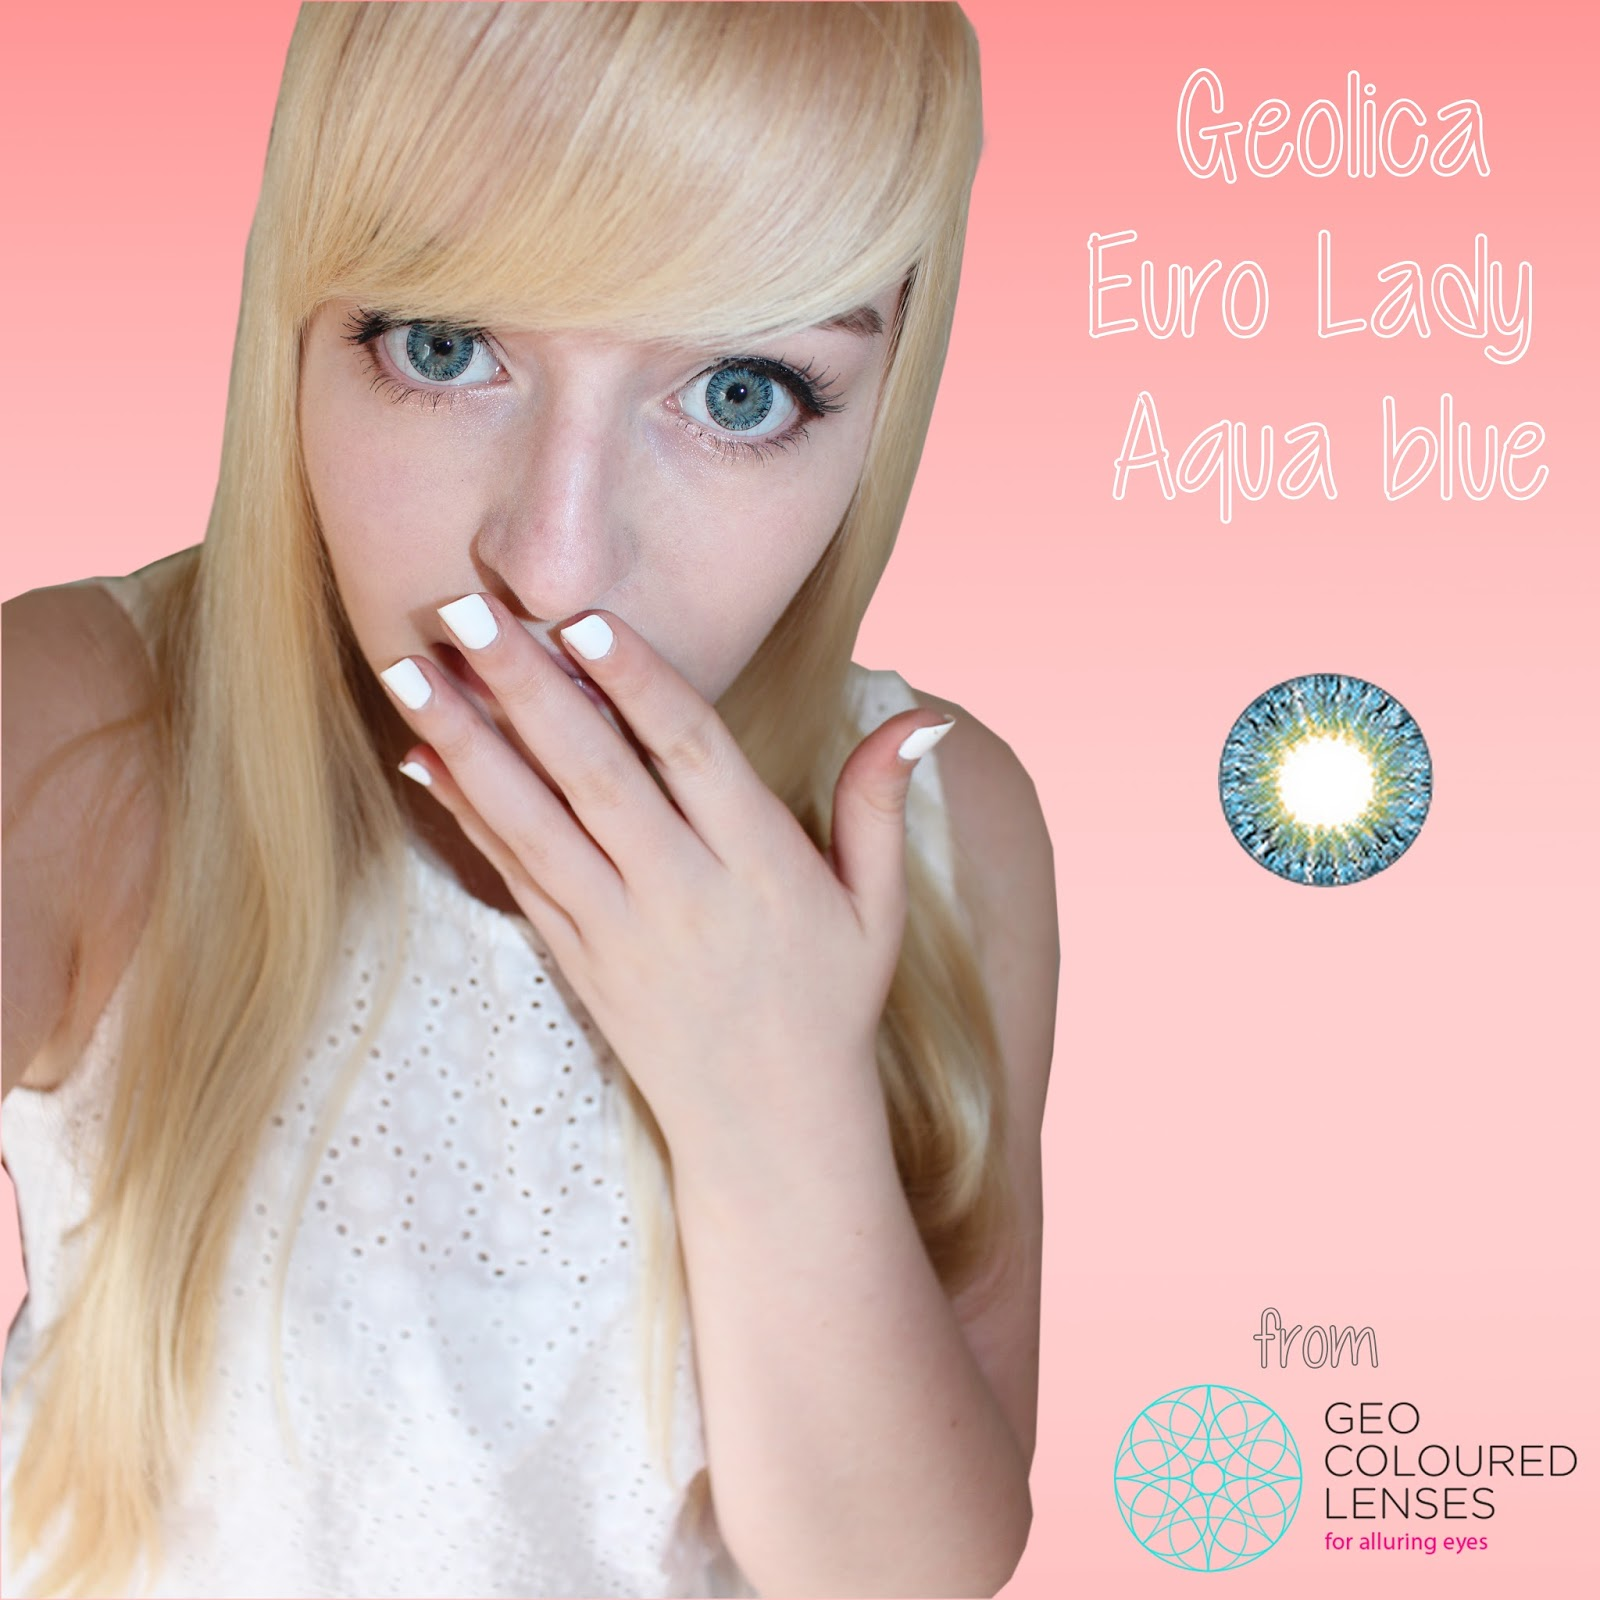 http://www.geocolouredlenses.com/geolica-euro-lady-aqua-blue/